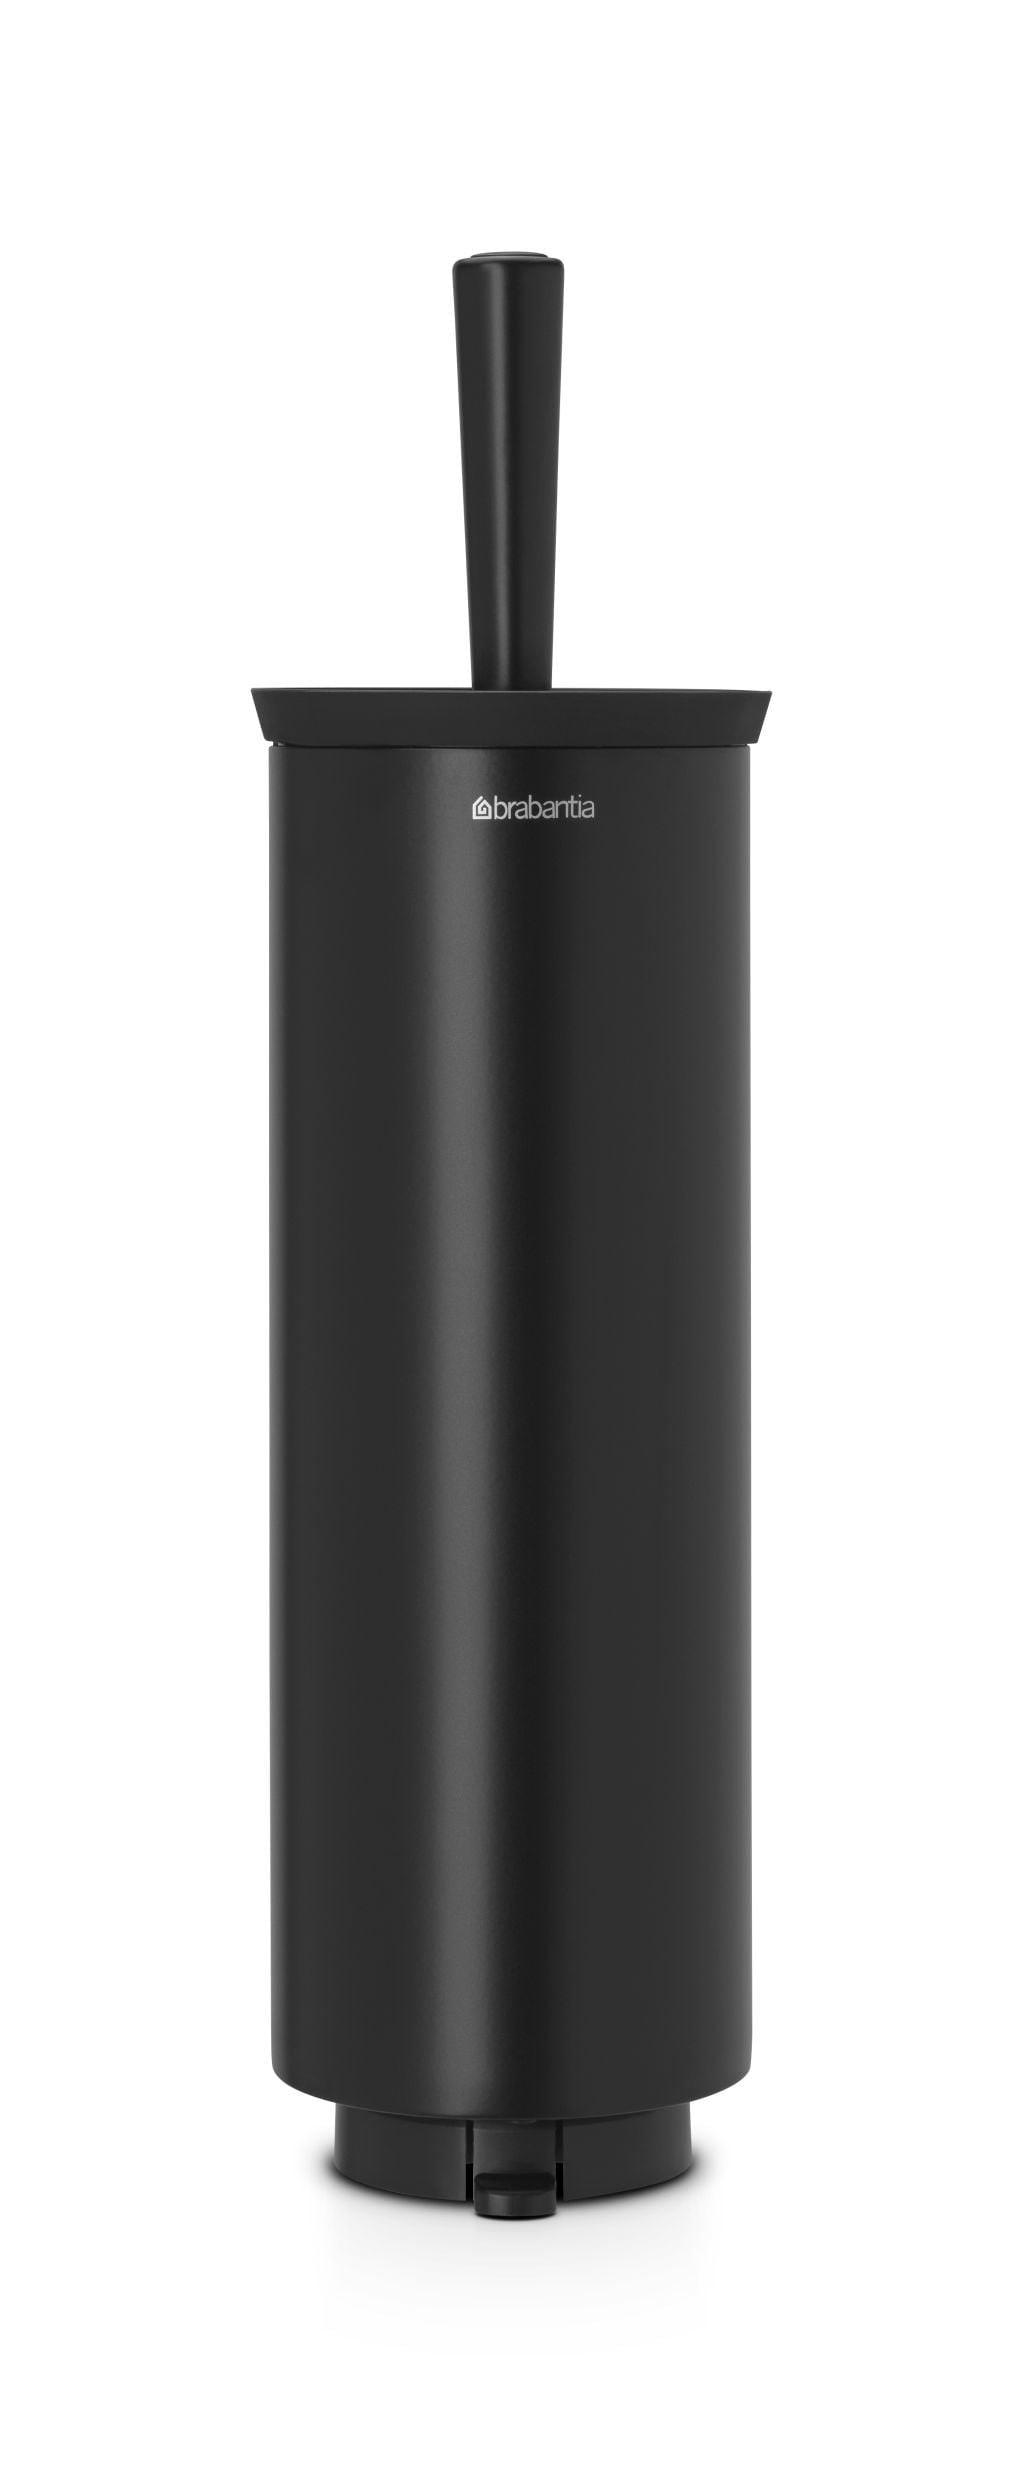 Brabantia Toiletborstel met Houder Stainless Steel-Matt Black